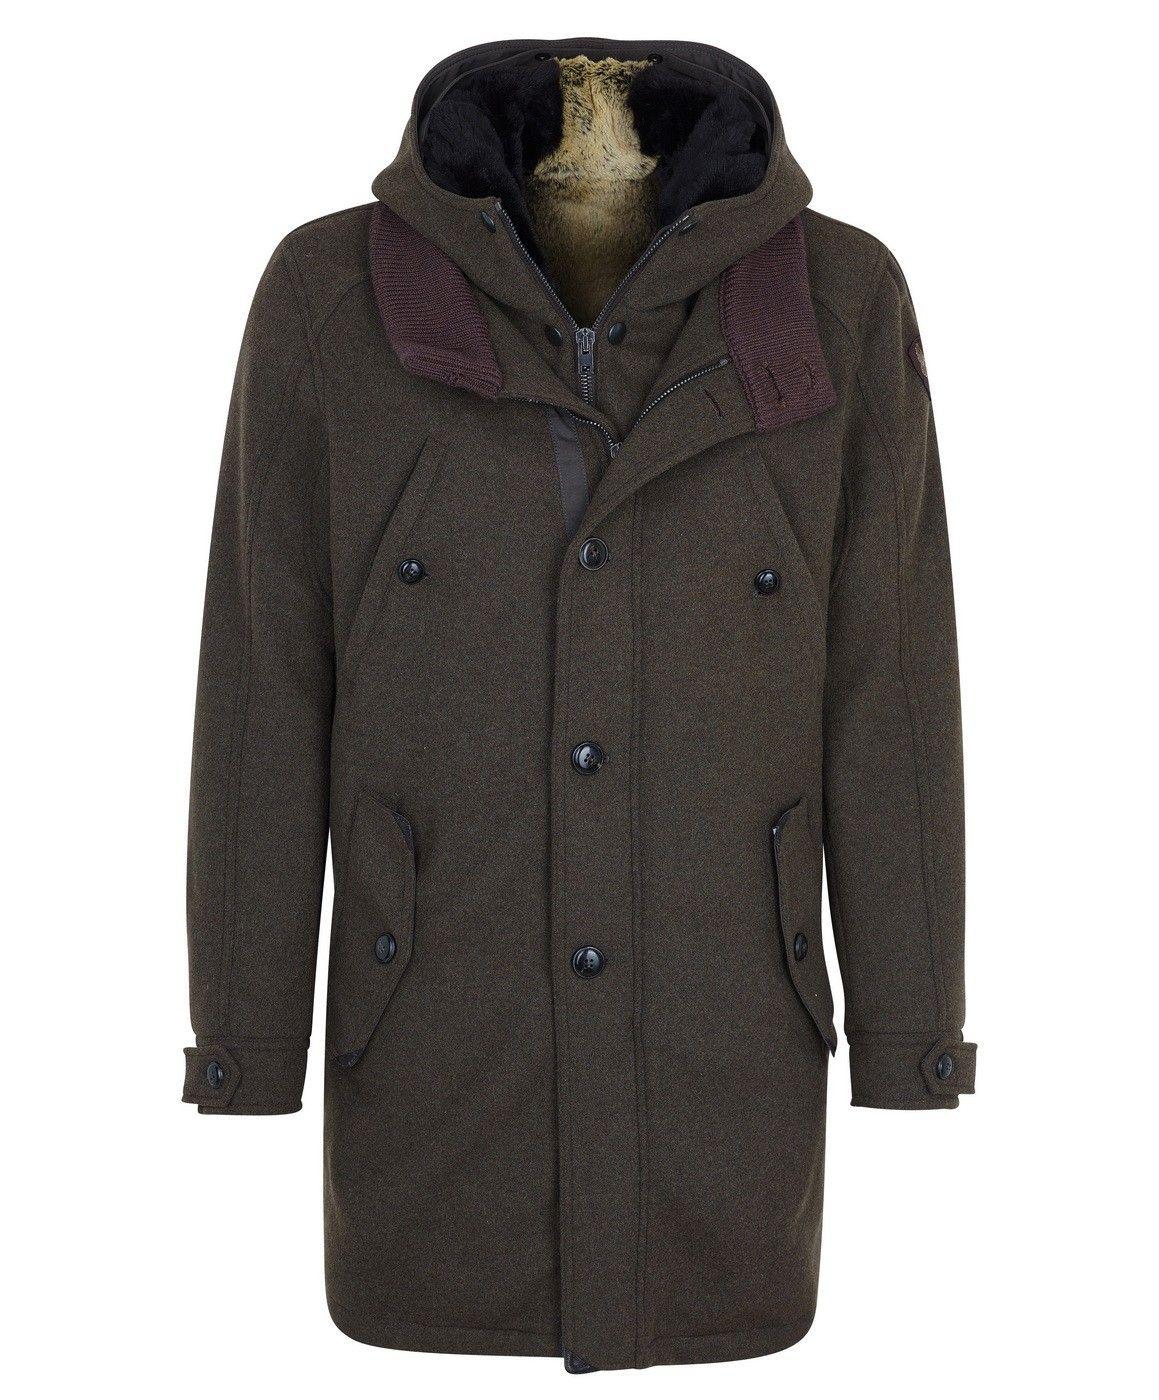 CERVOLANTE - Herrenparka - Parka Wool Fabric Hood Lapin - Origin braun